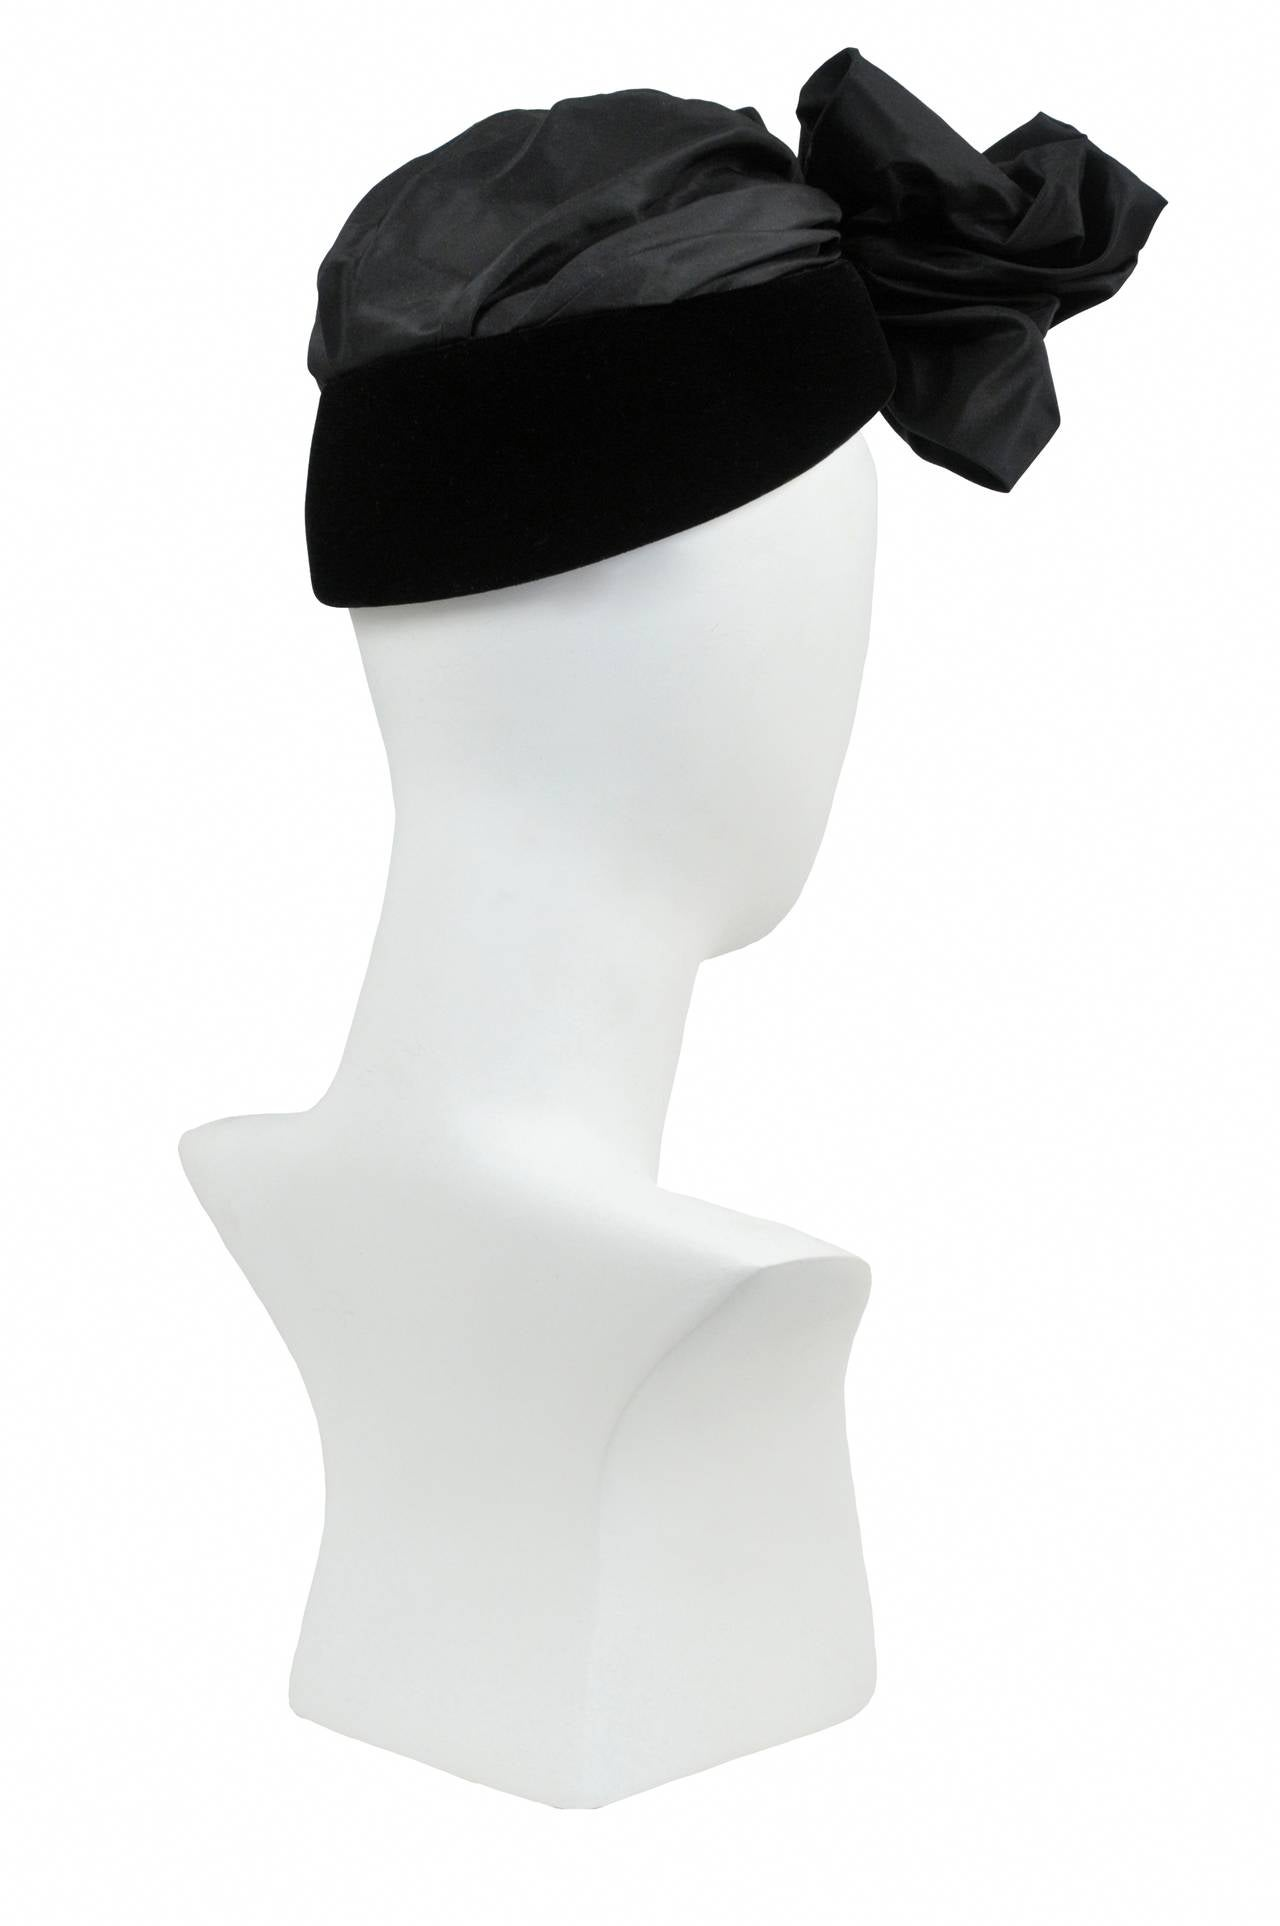 Iconic Saint Laurent Turban Hat 3